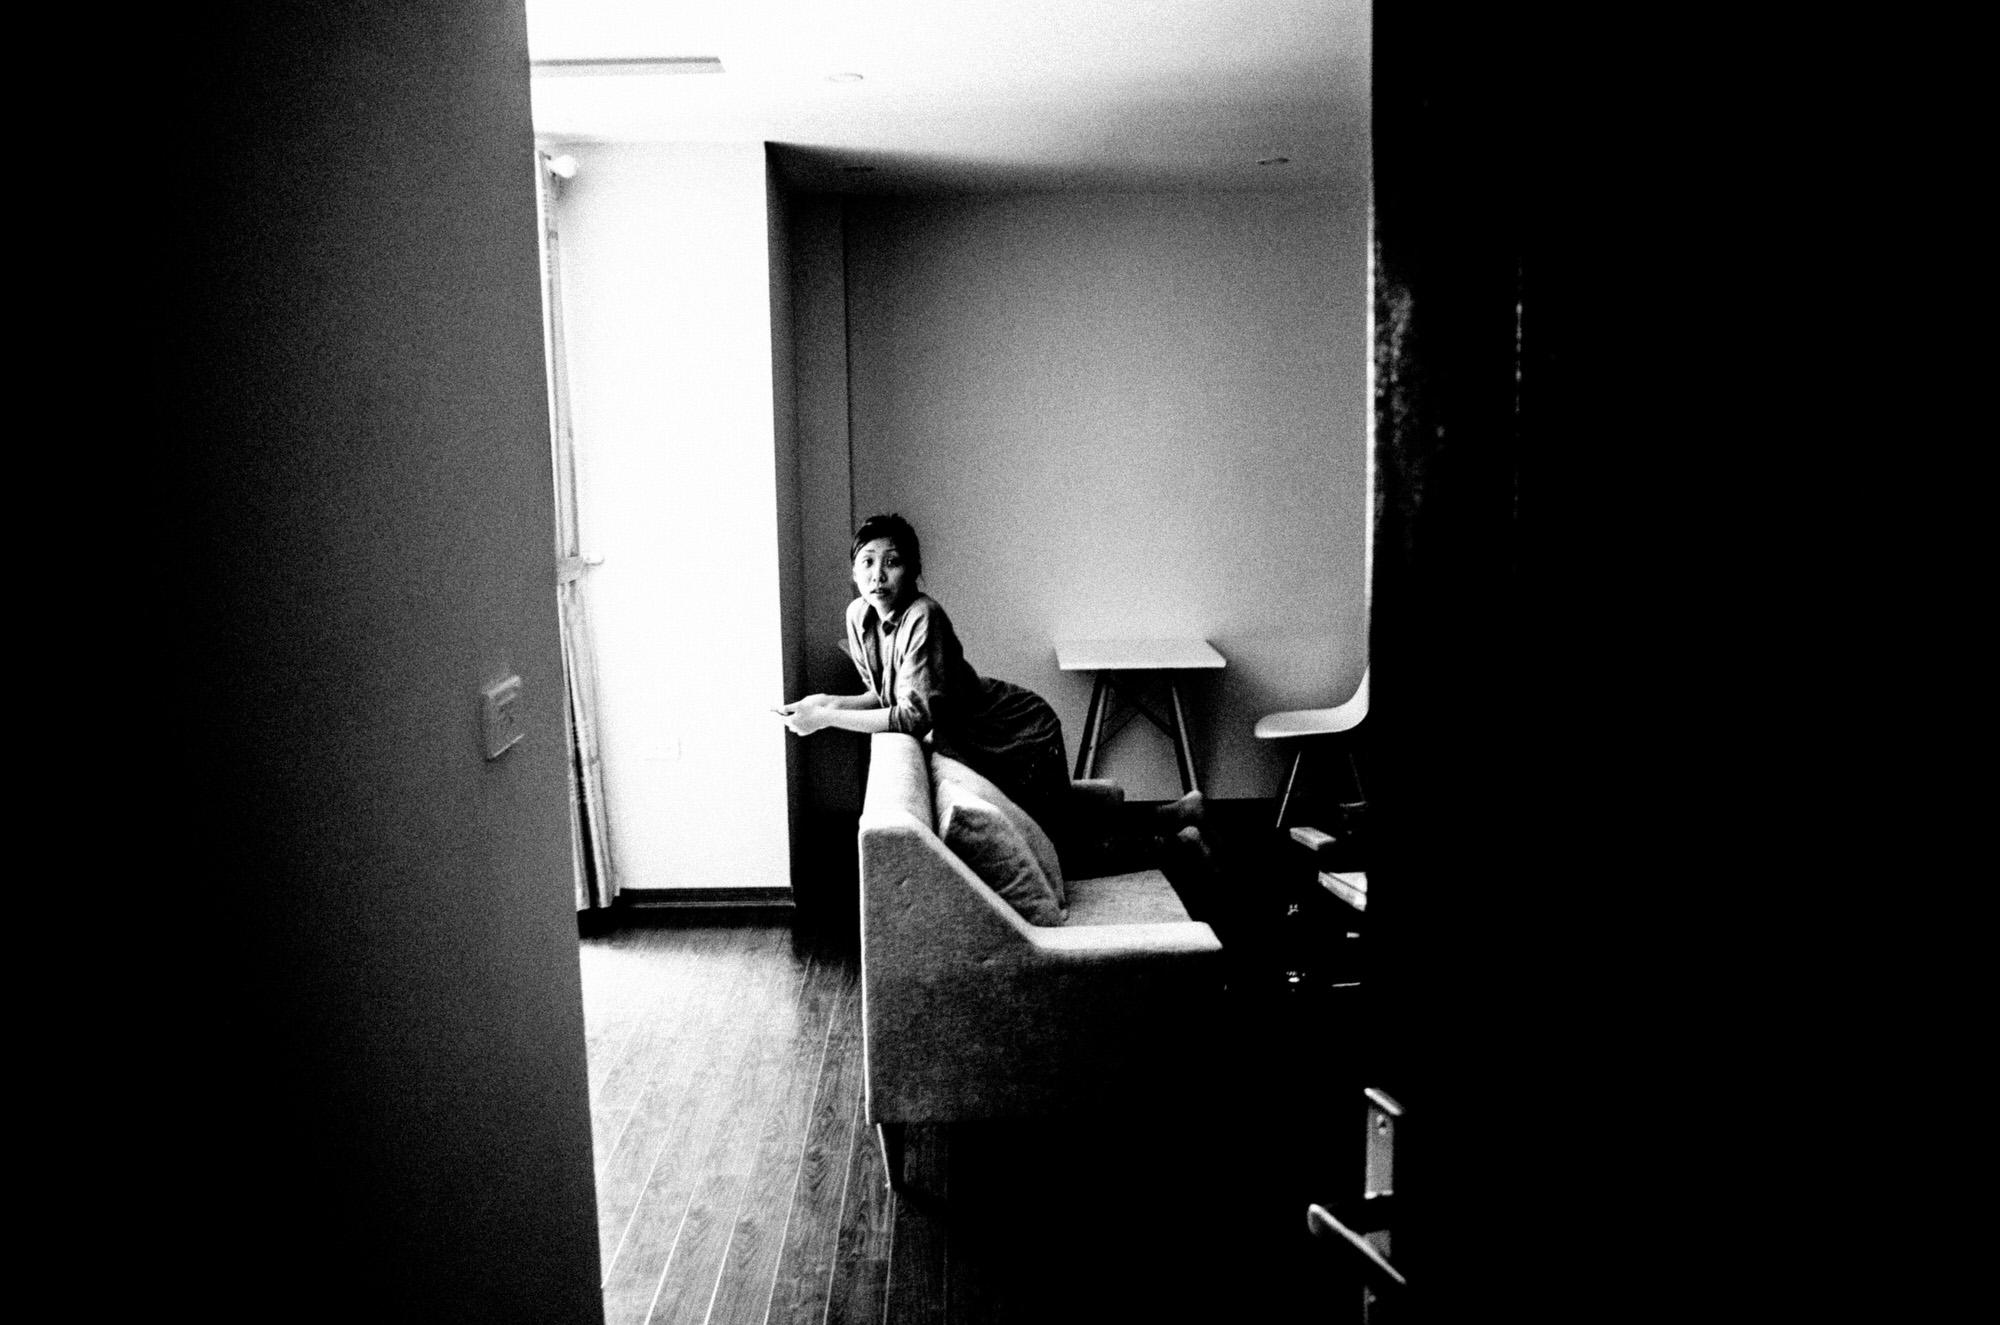 eric kim photography black and white - eric kim black and white photography hanoi-0010386